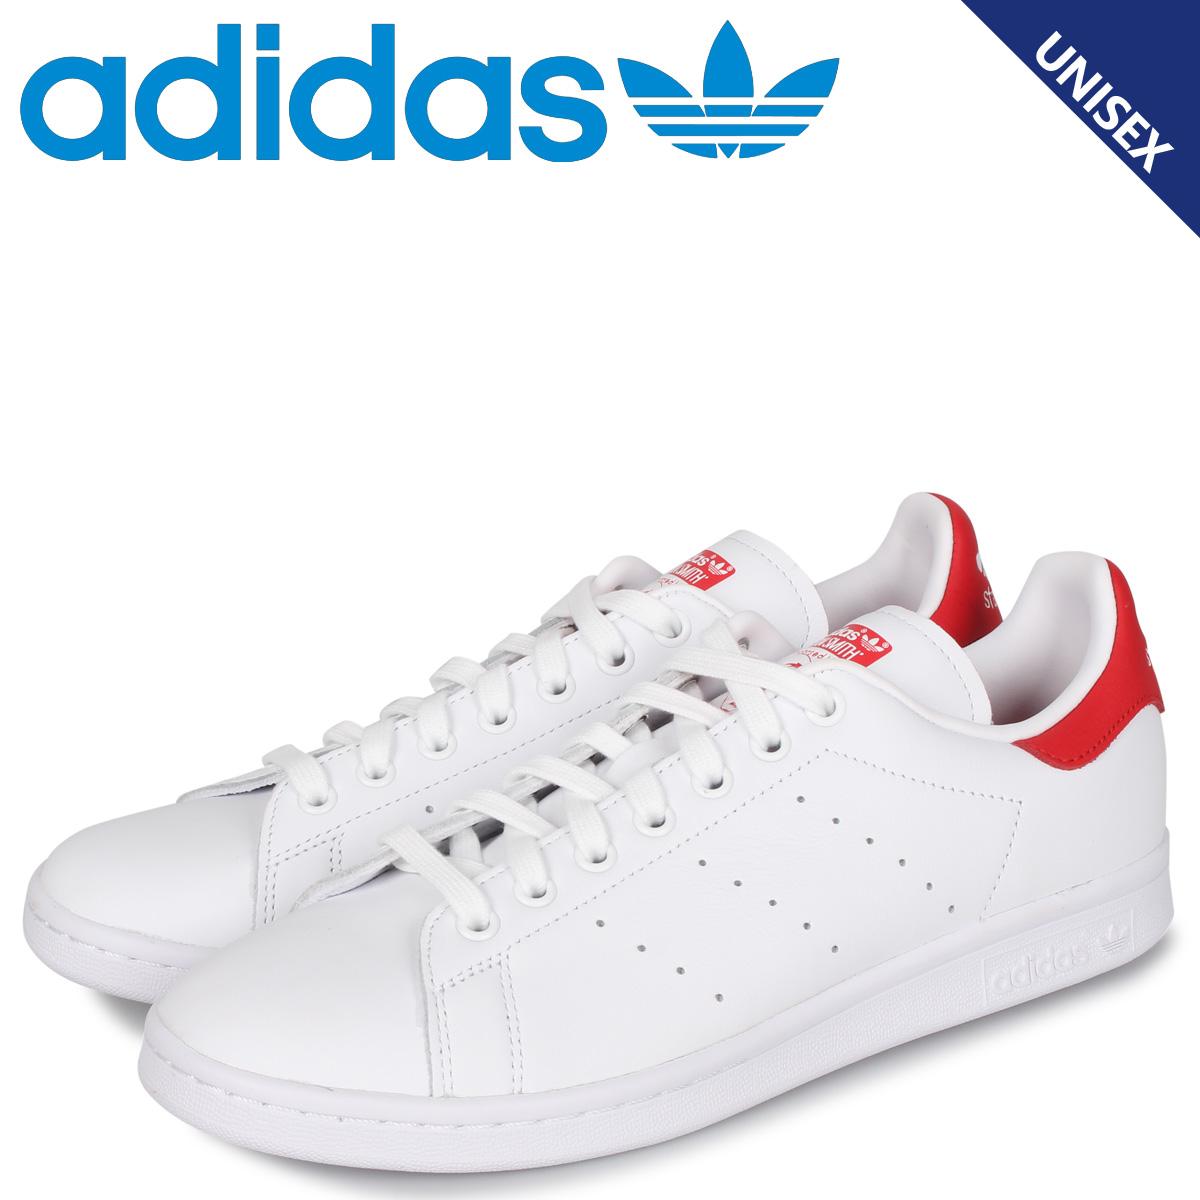 adidas Originals アディダス オリジナルス スタンスミス スニーカー メンズ レディース STANSMITH ホワイト 白 EF4334